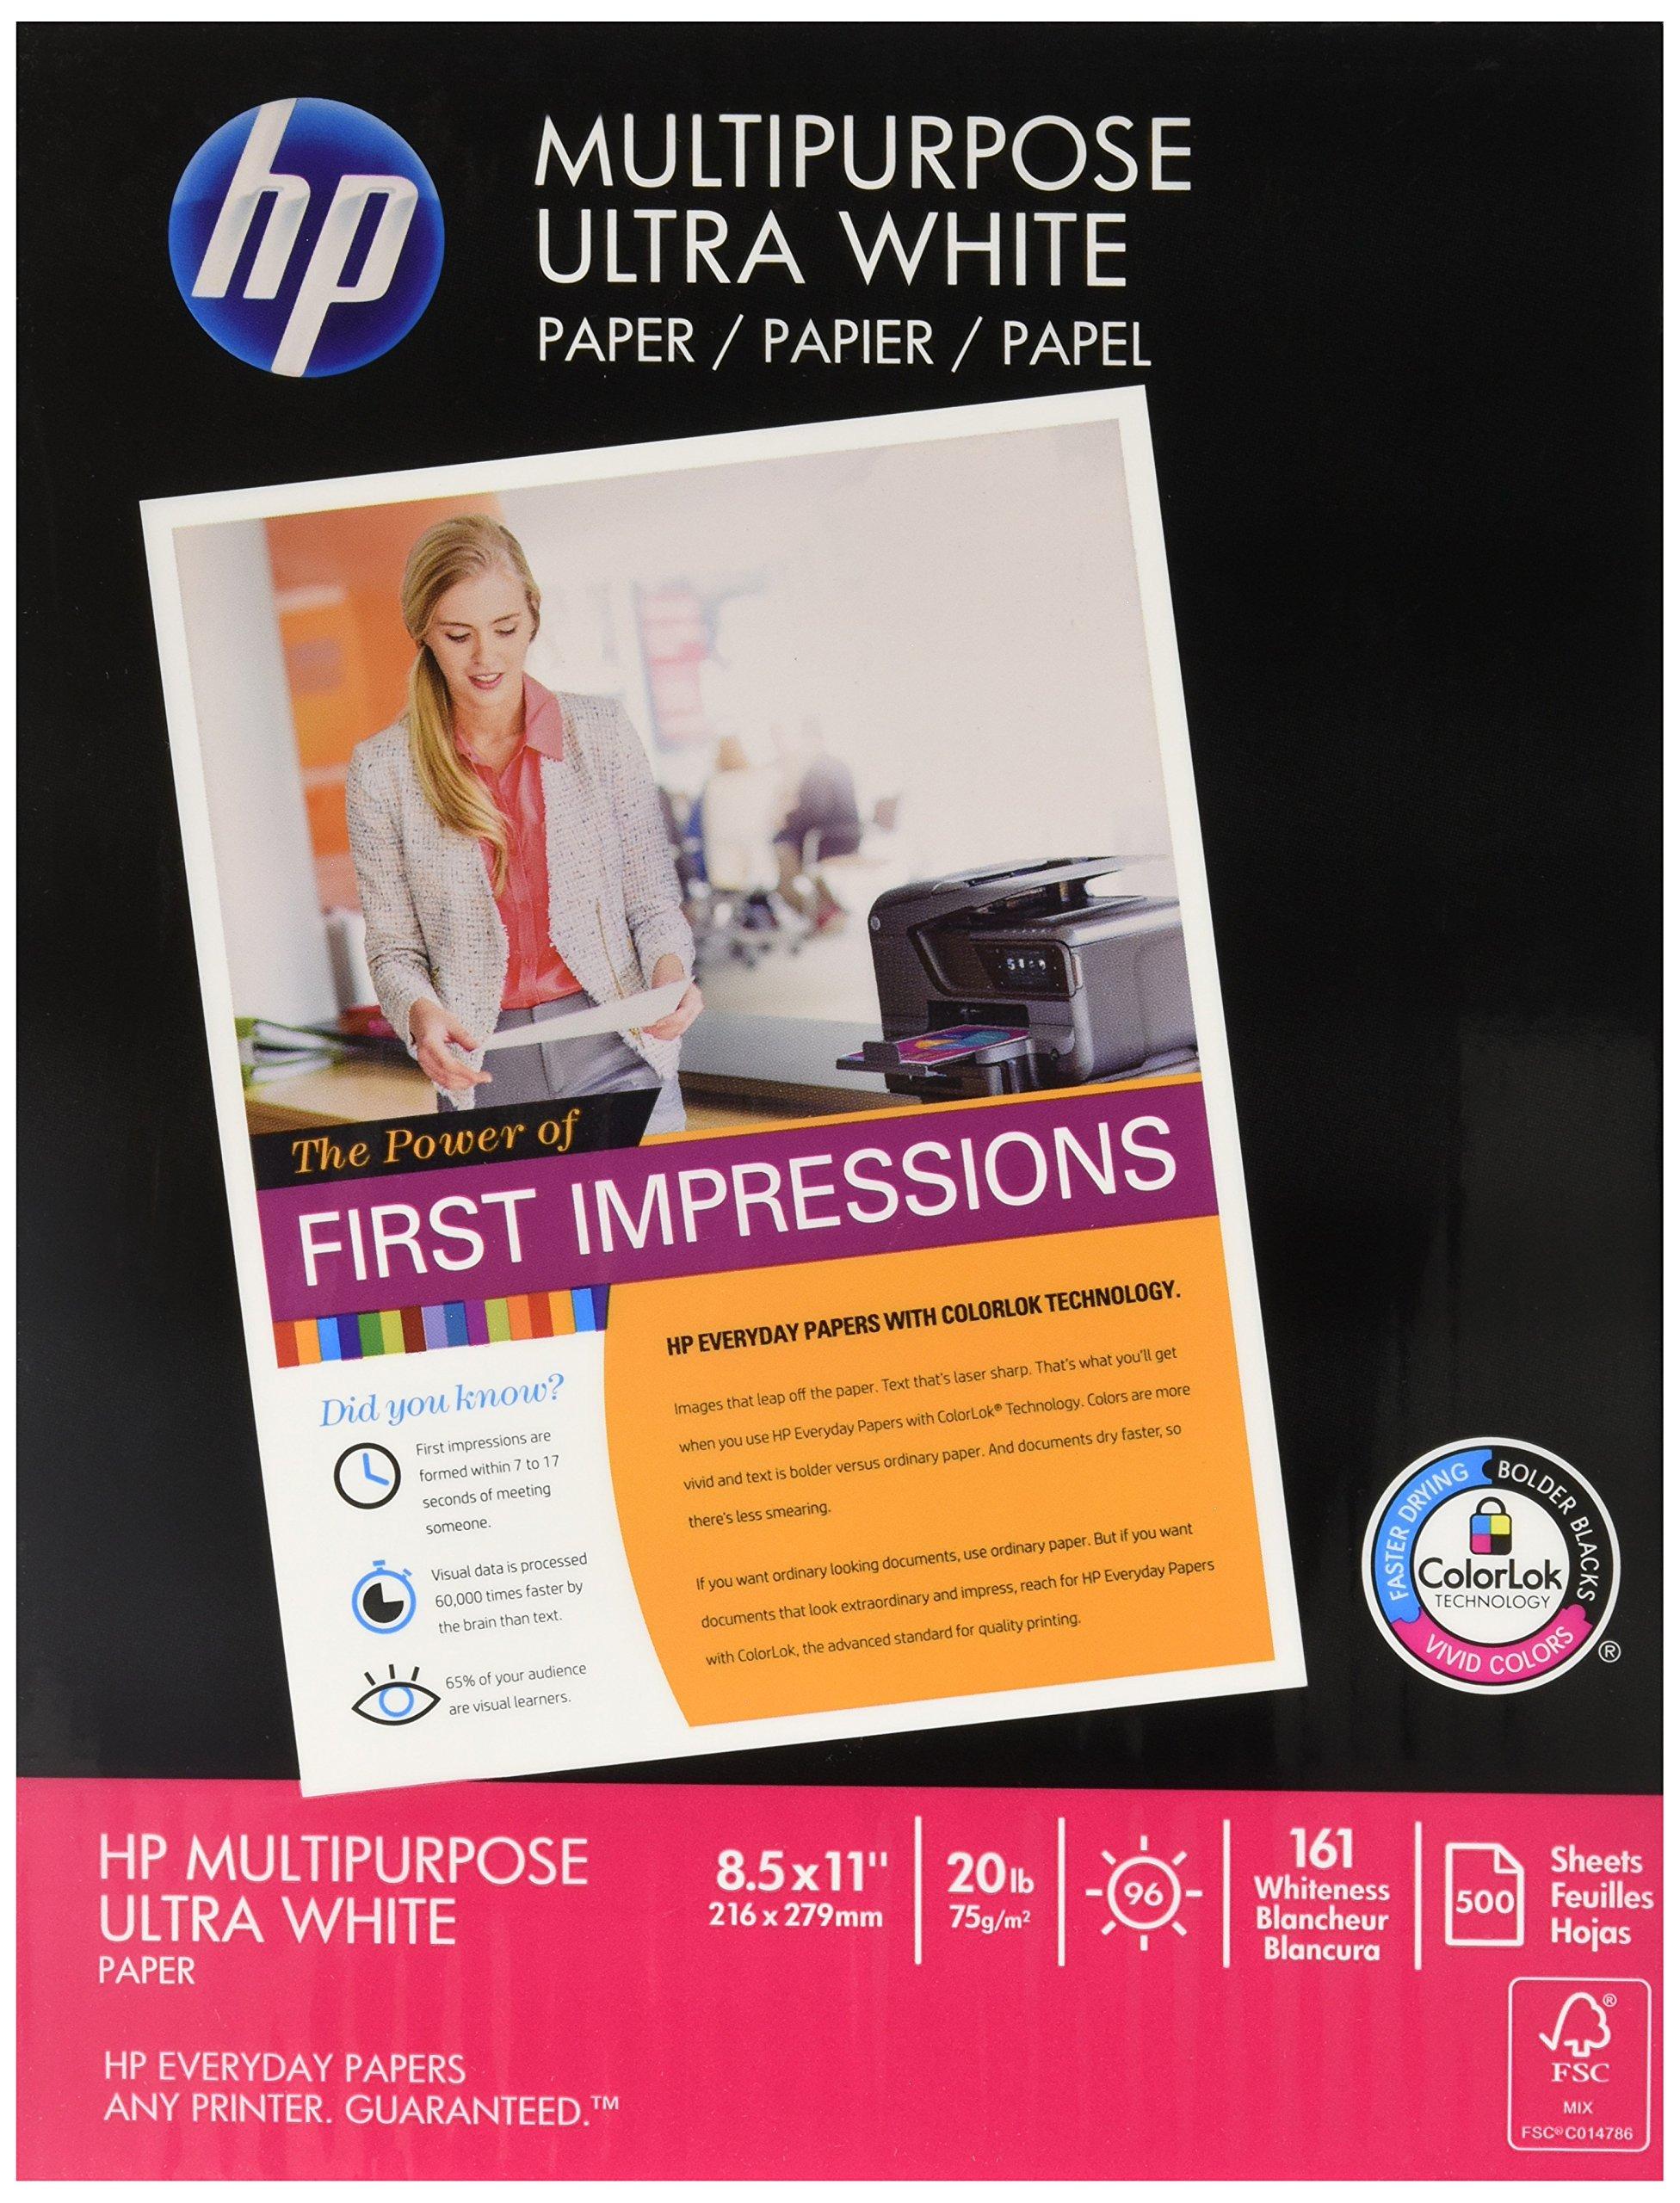 HP Multipurpose Case Copy/Laser/Inkjet Paper, 96 White Brightness, 20 lb, Letter Size (8.5 x 11), 5000 Sheets Carton (HPM1120)